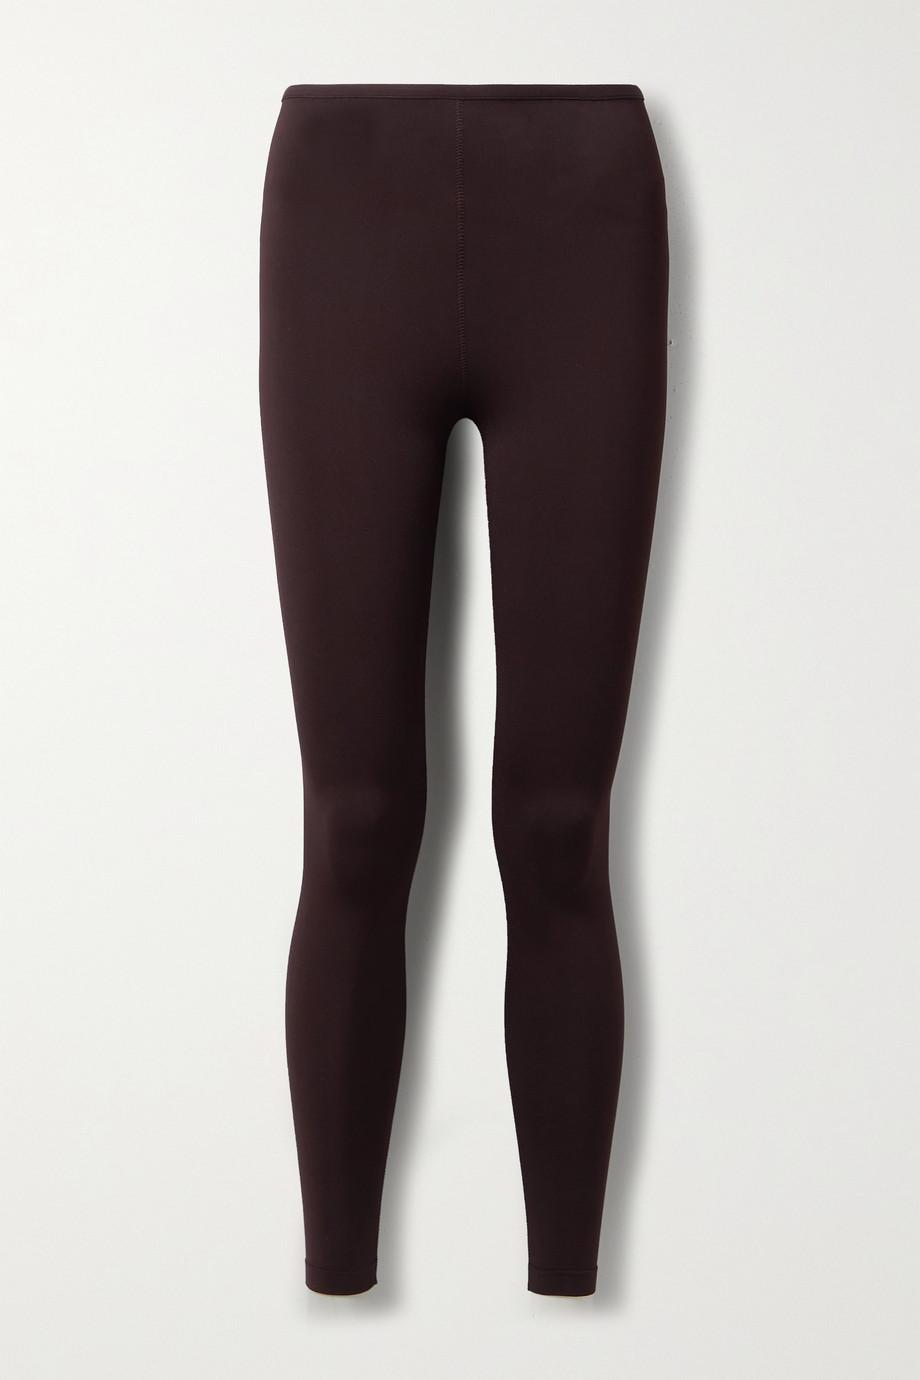 Alaïa Stretch-knit leggings